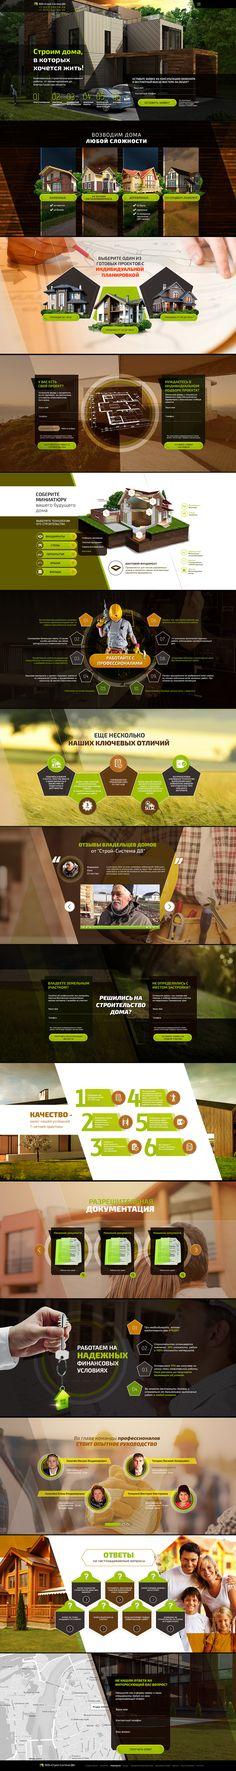 developed by High Grades Media #landing, #page, #design, #web, #HTML5, #photoshop, #website